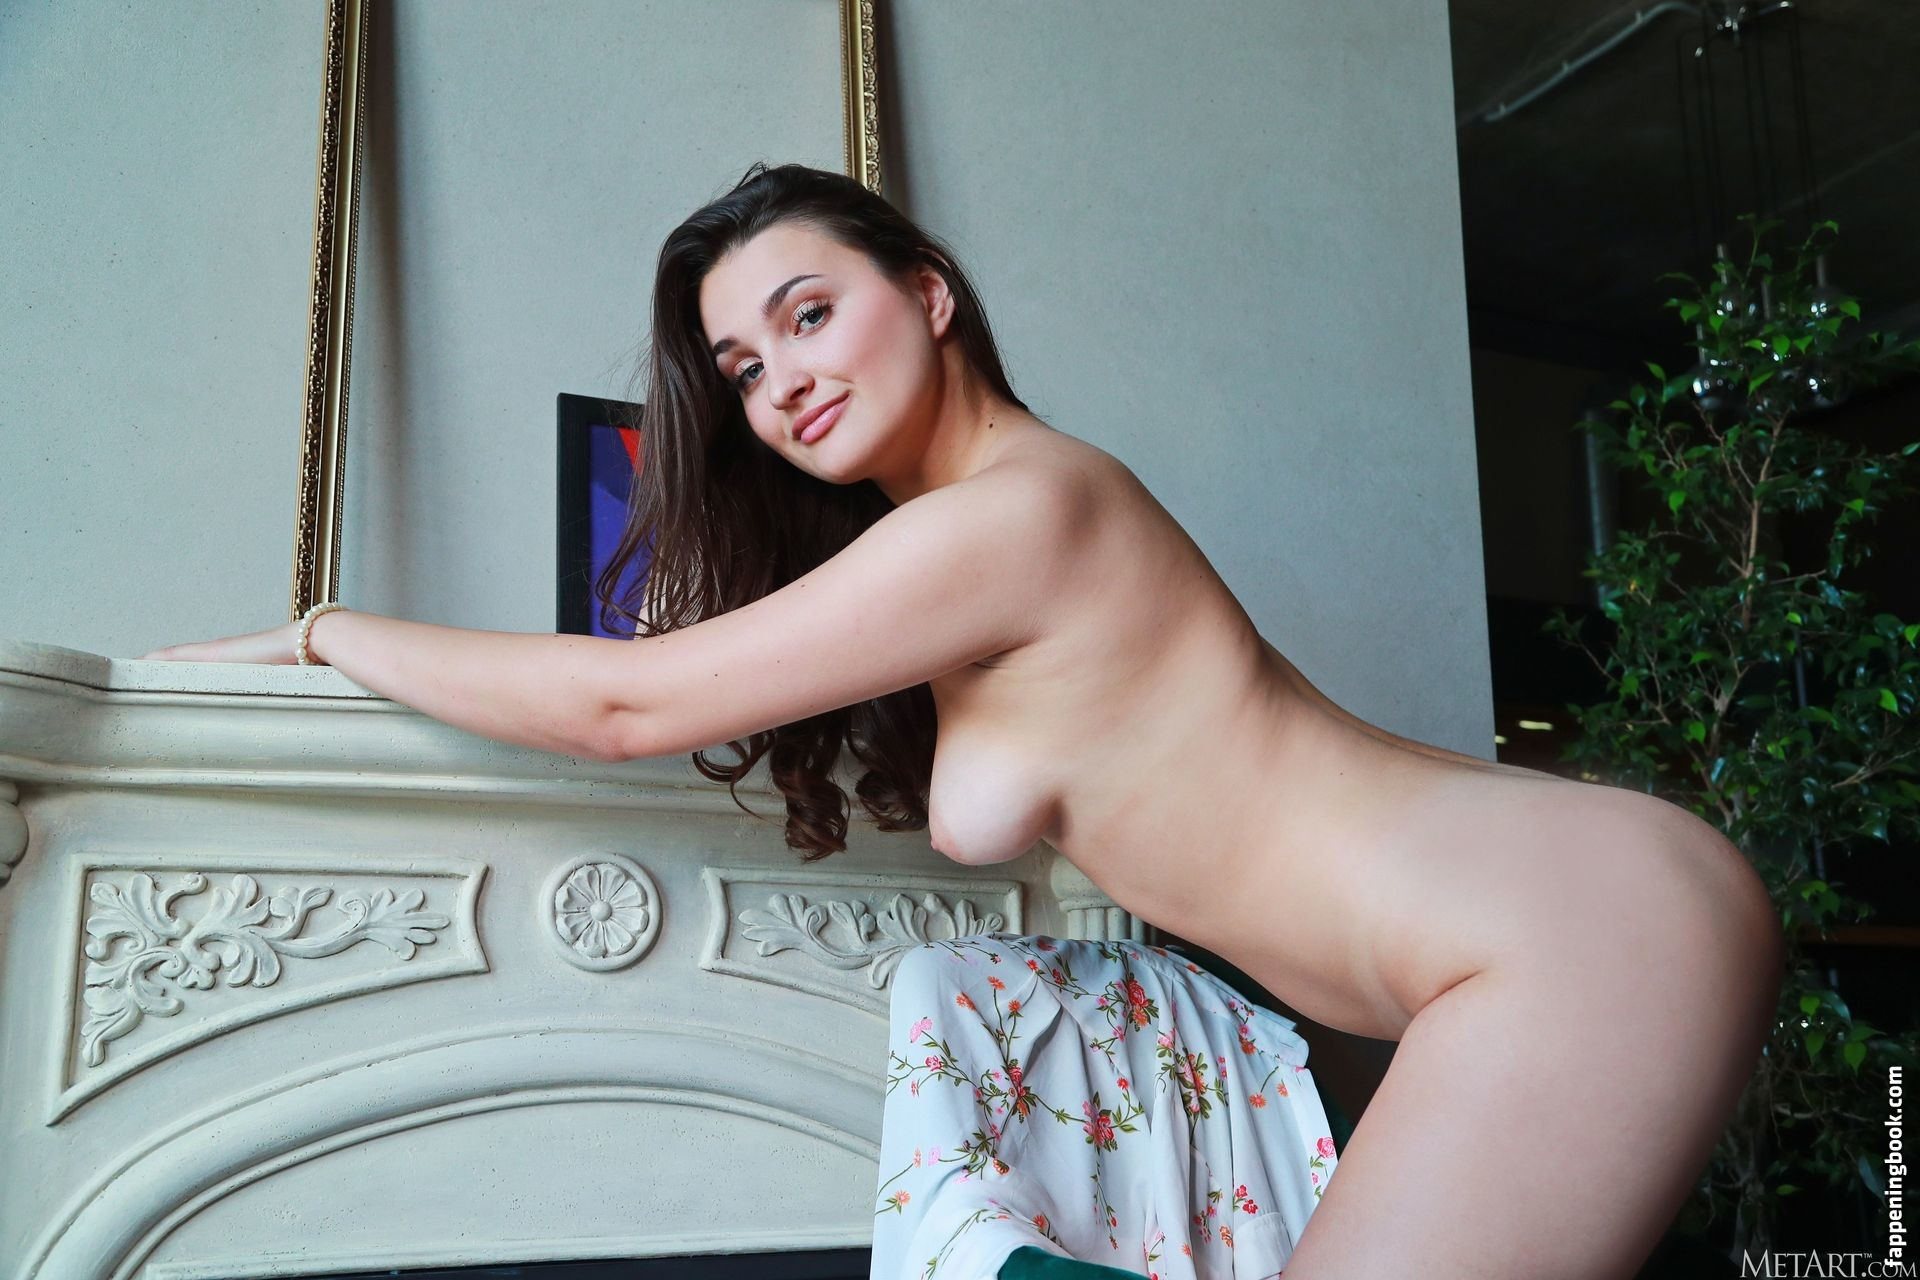 Vavilia Cristoff Nude